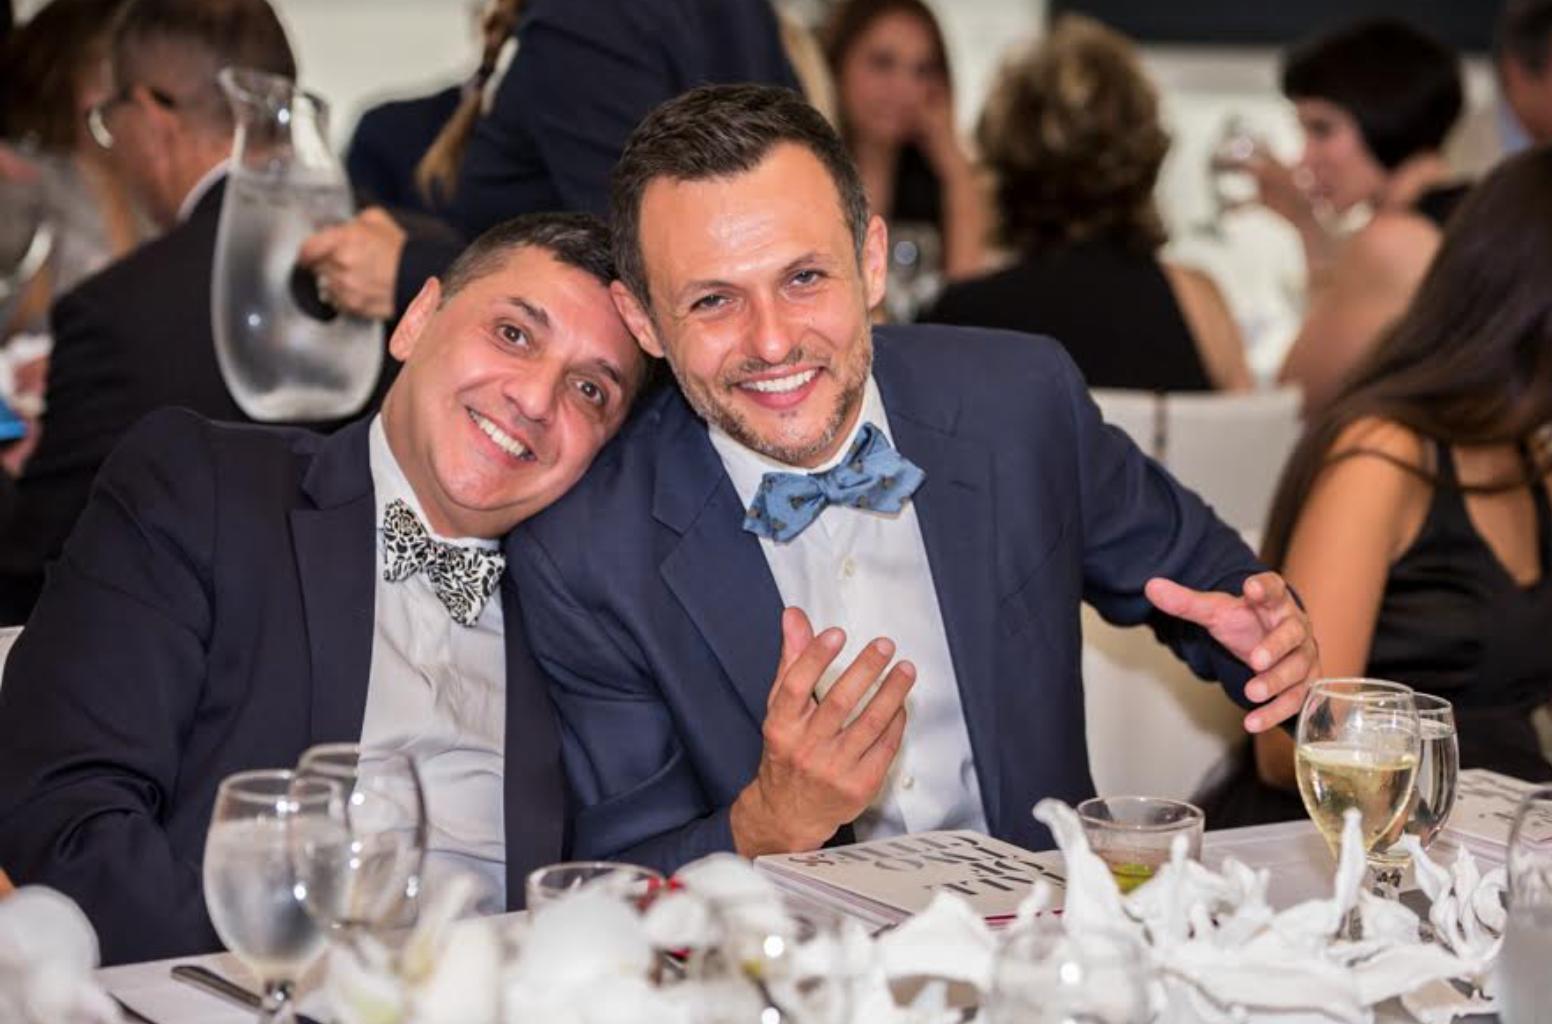 Babak Movahedi & Igor